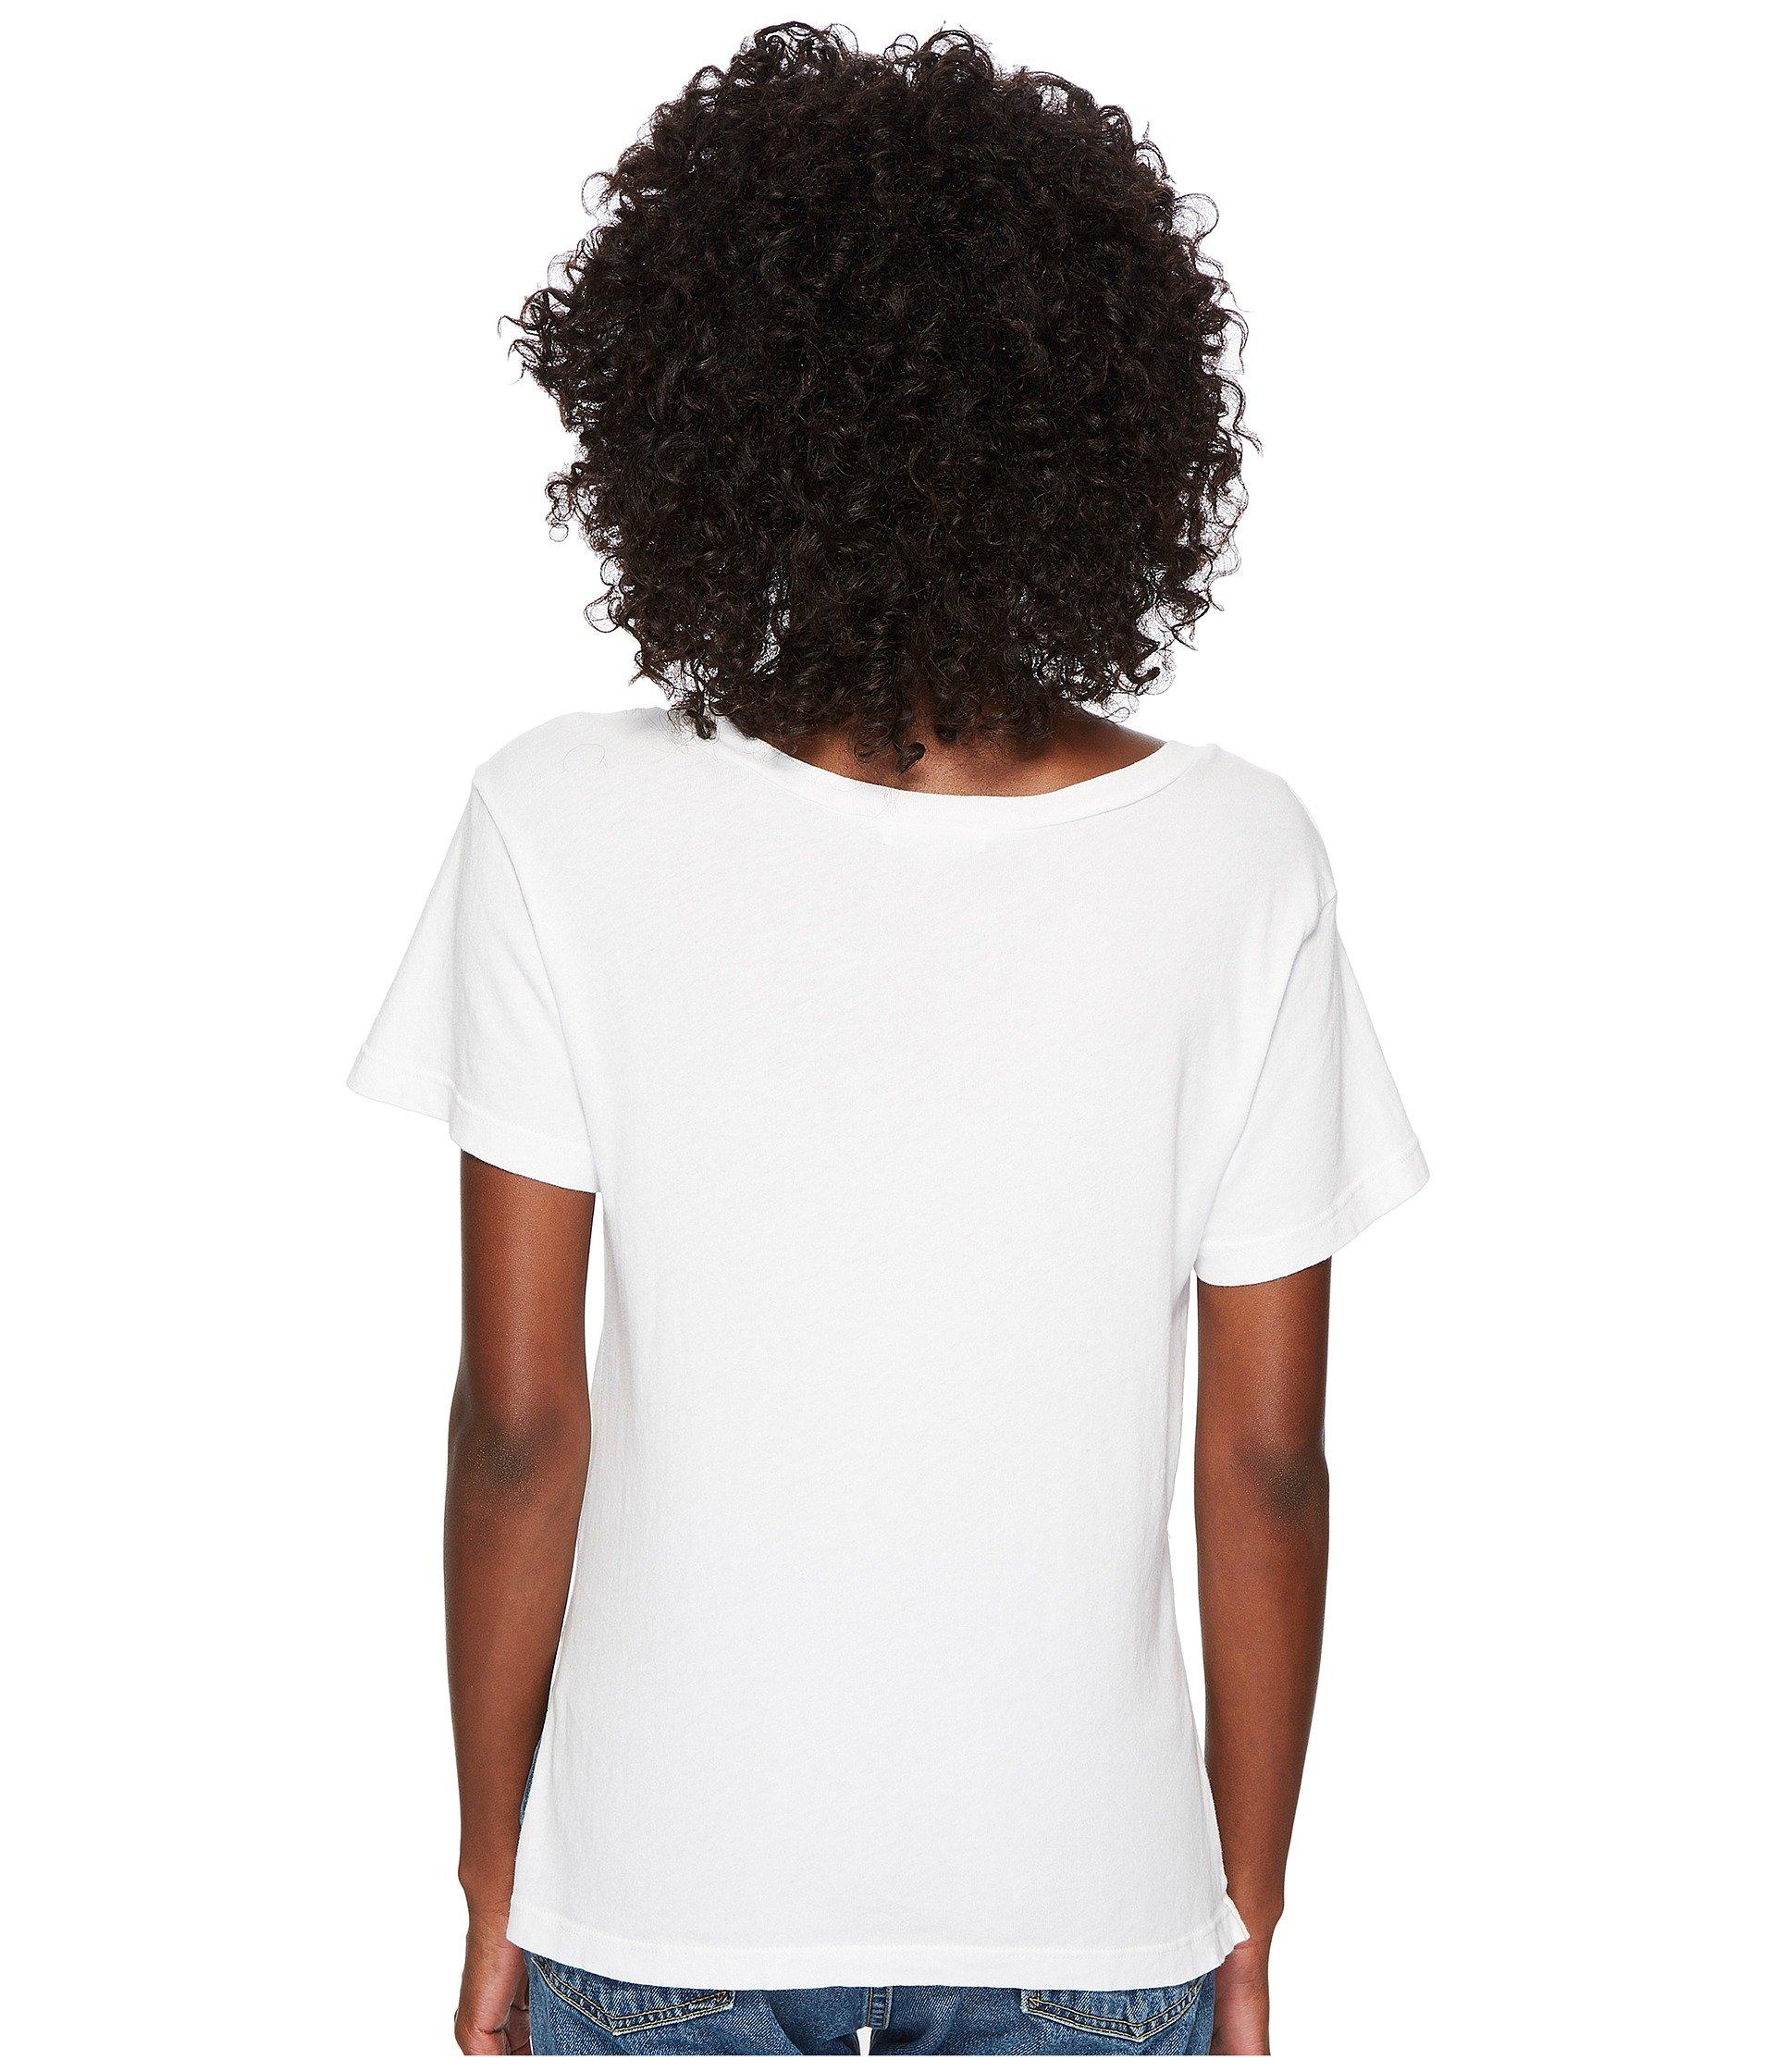 White Lna V Reese neck neck Reese Lna V qFpO0Ow